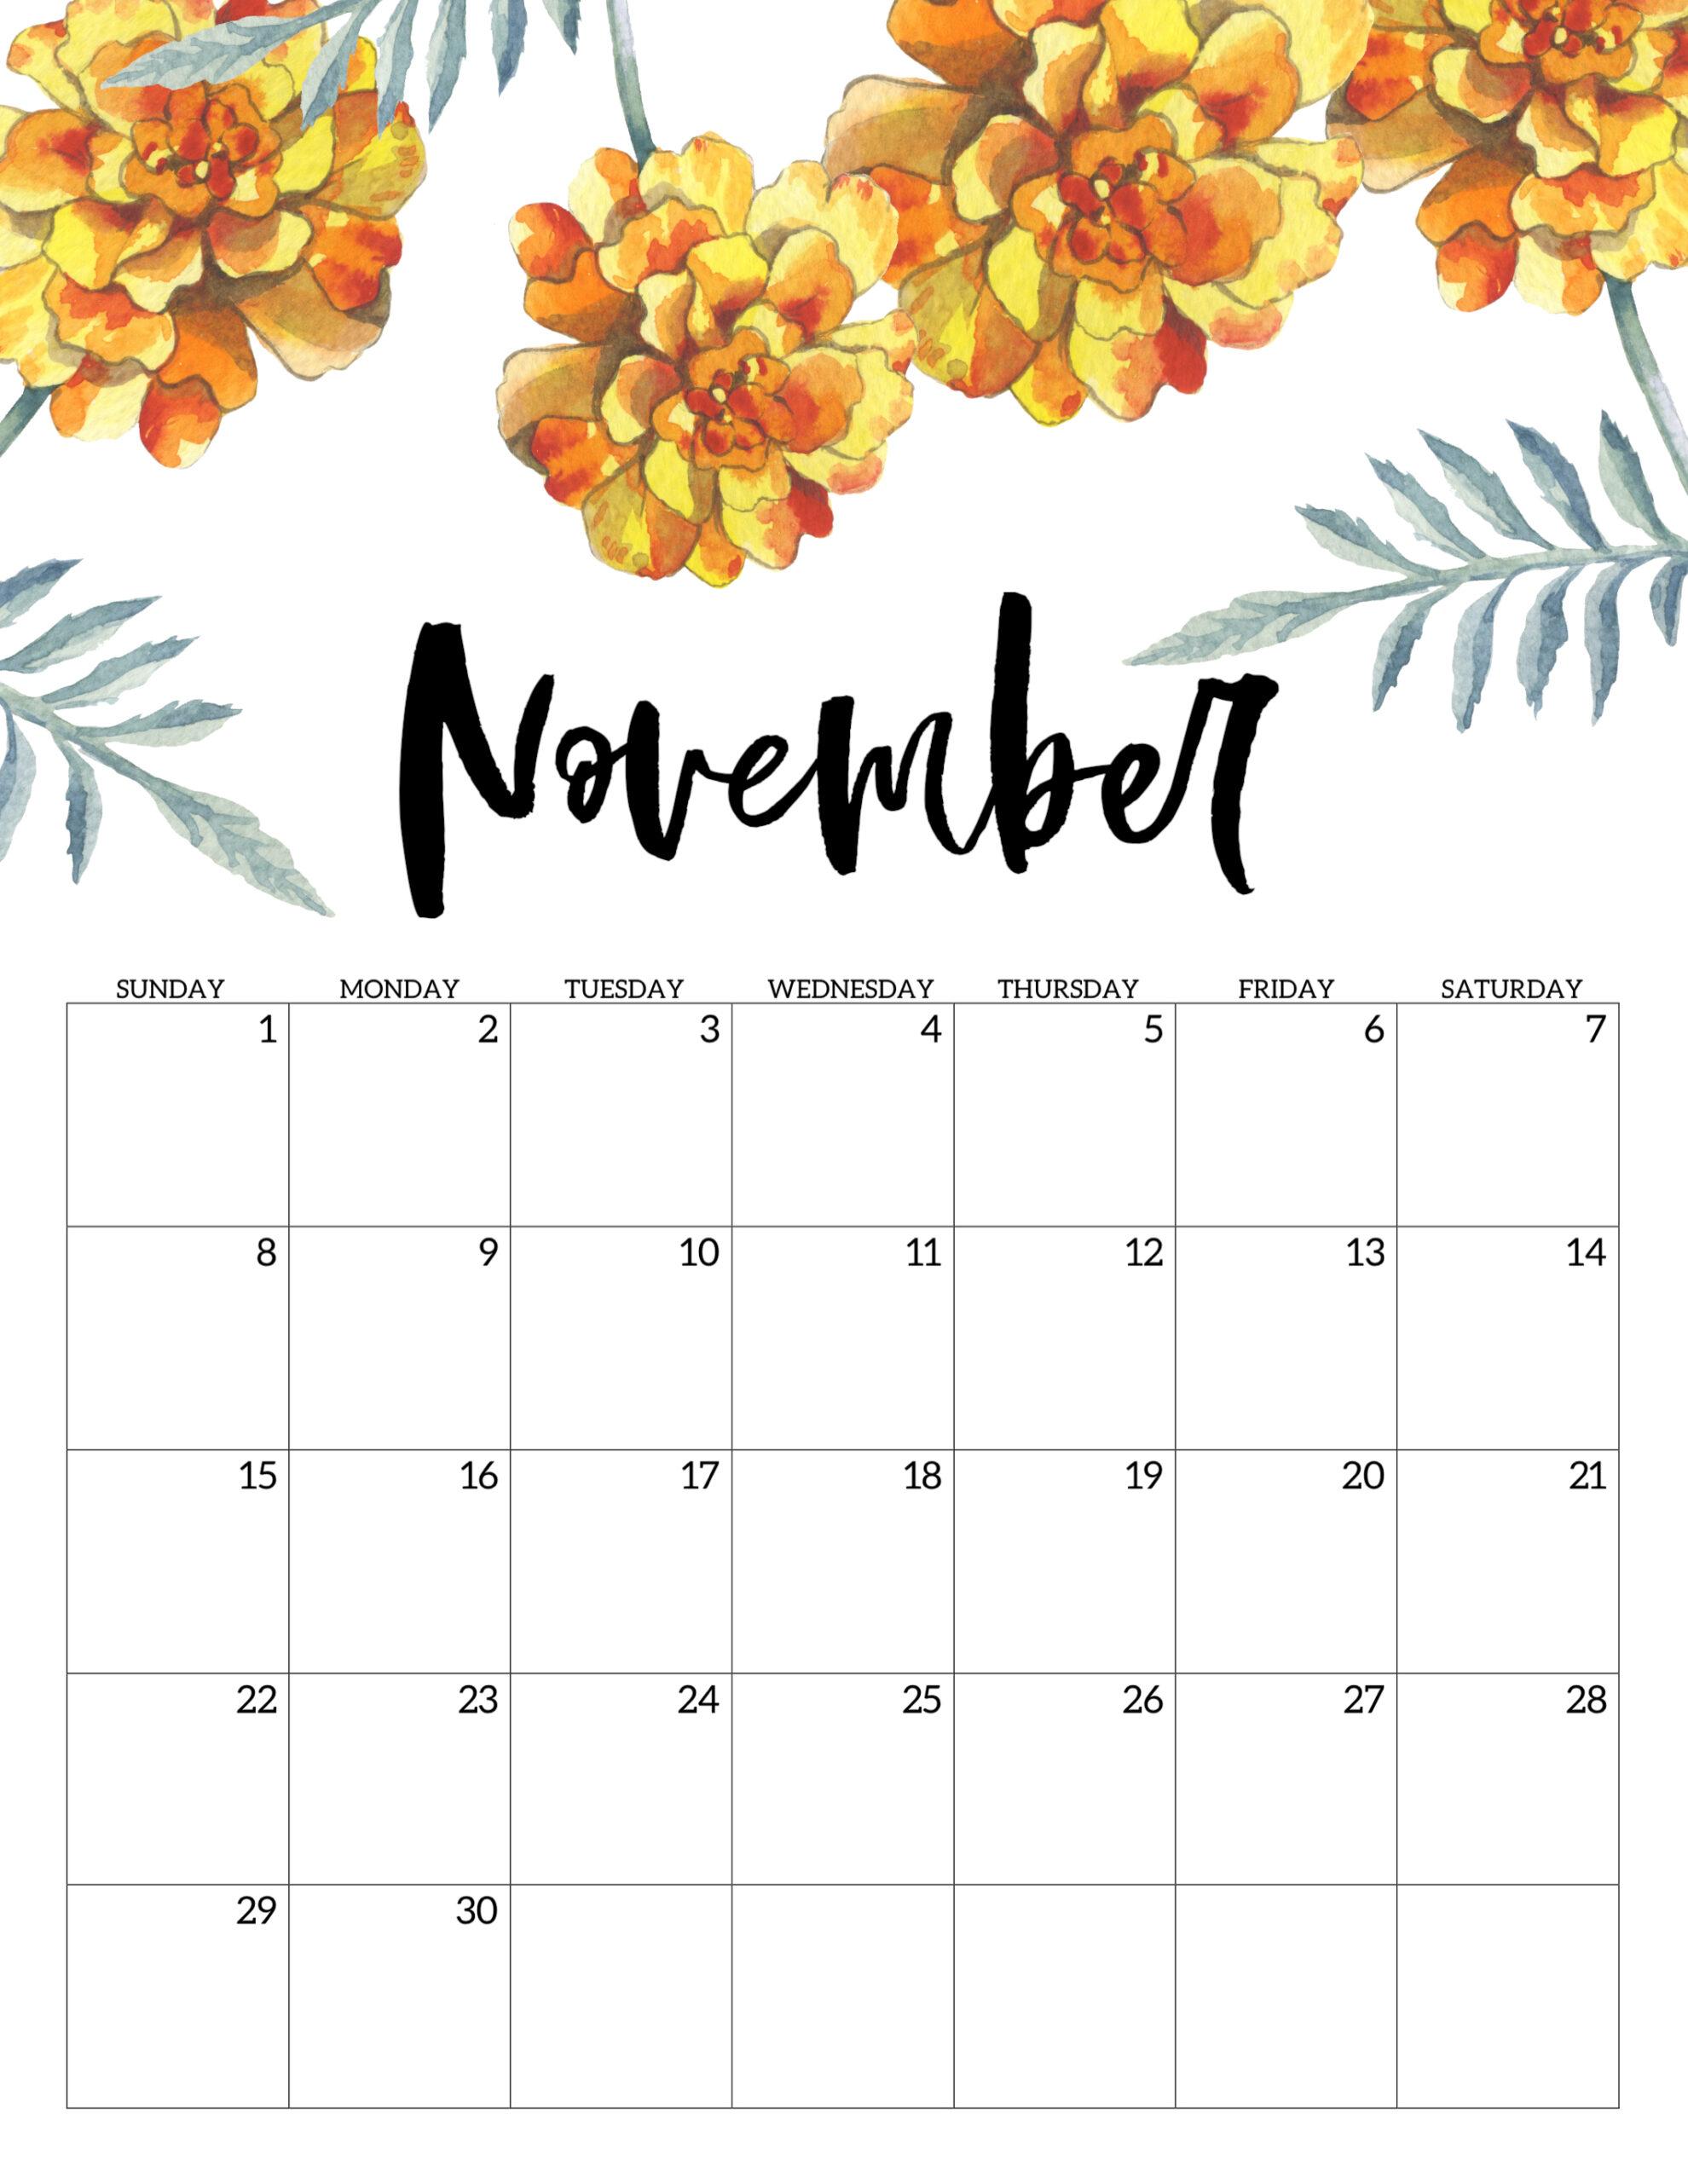 Free Printable Calendar 2020  Floral  Paper Trail Design with regard to December Calendar 2020 Pinterest